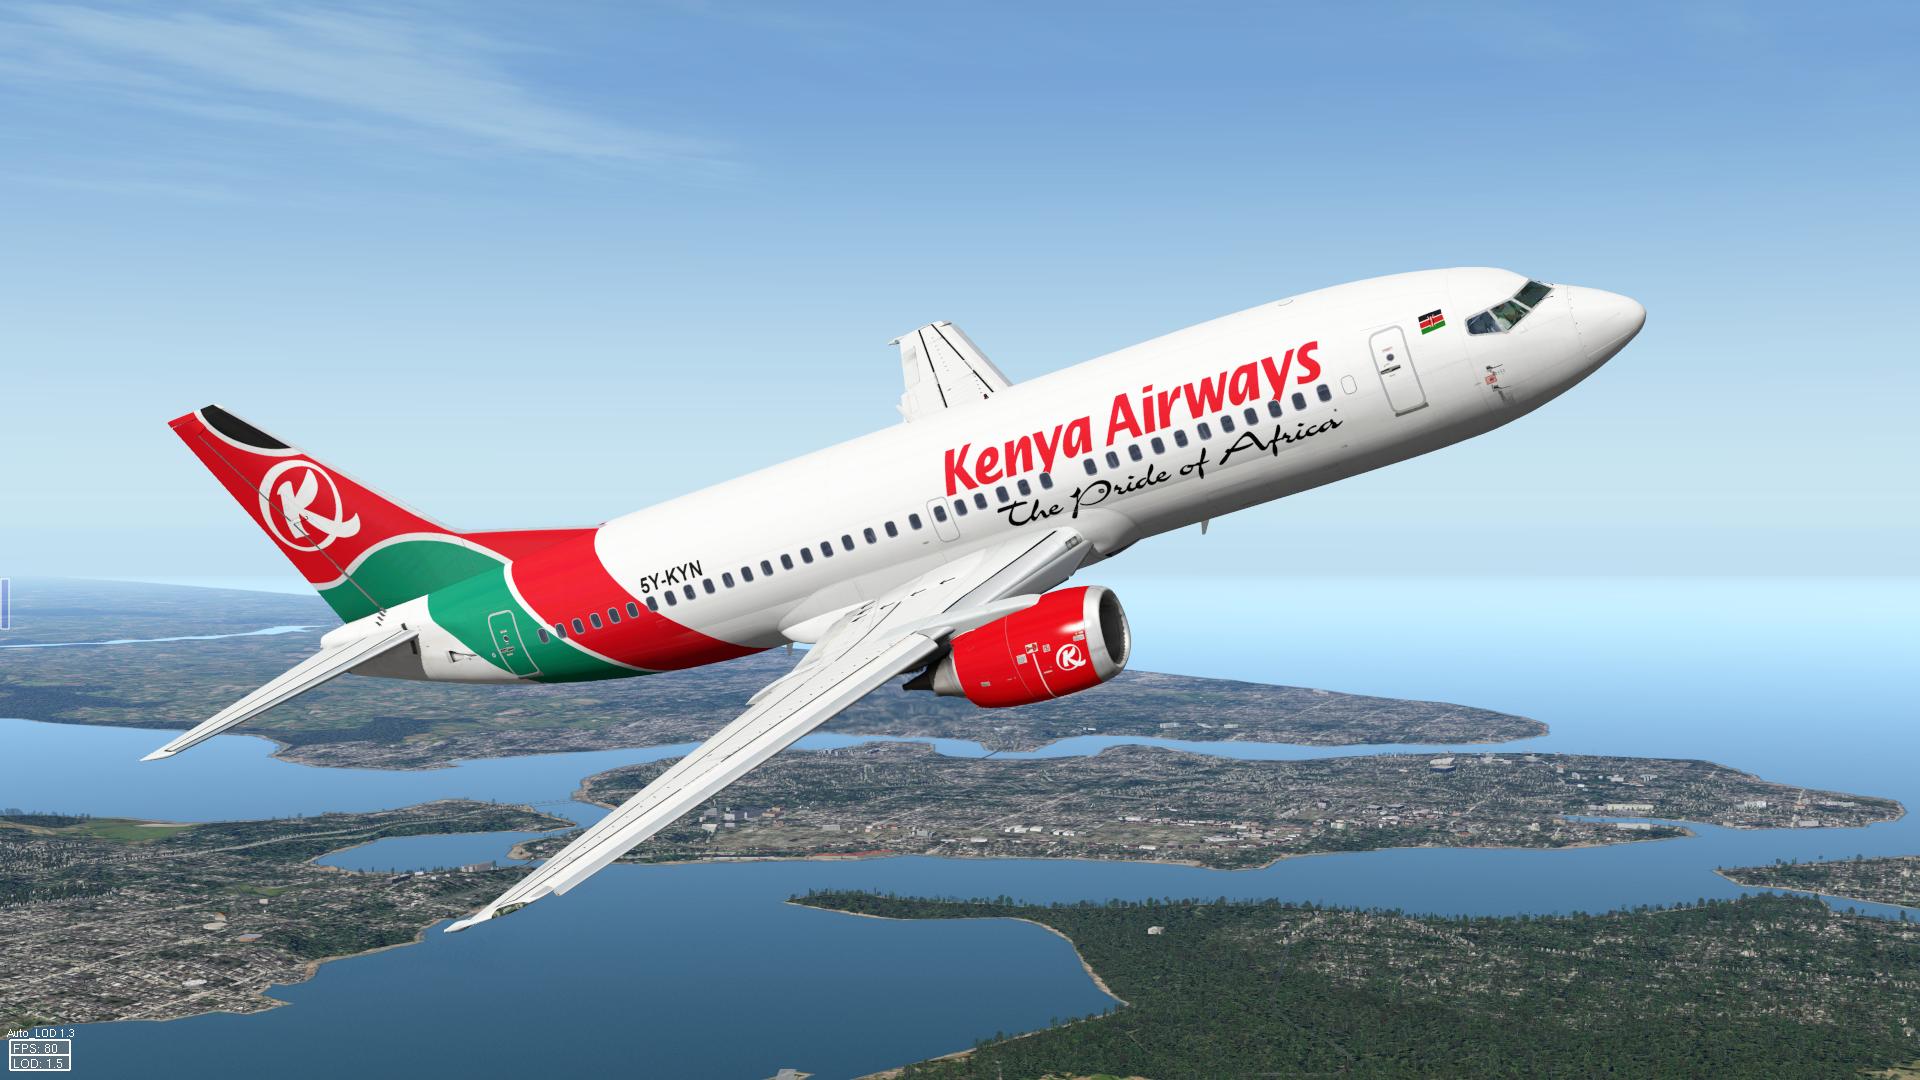 Take Off To Usa Amid Sh6 Billion Loss For Kenya Airways